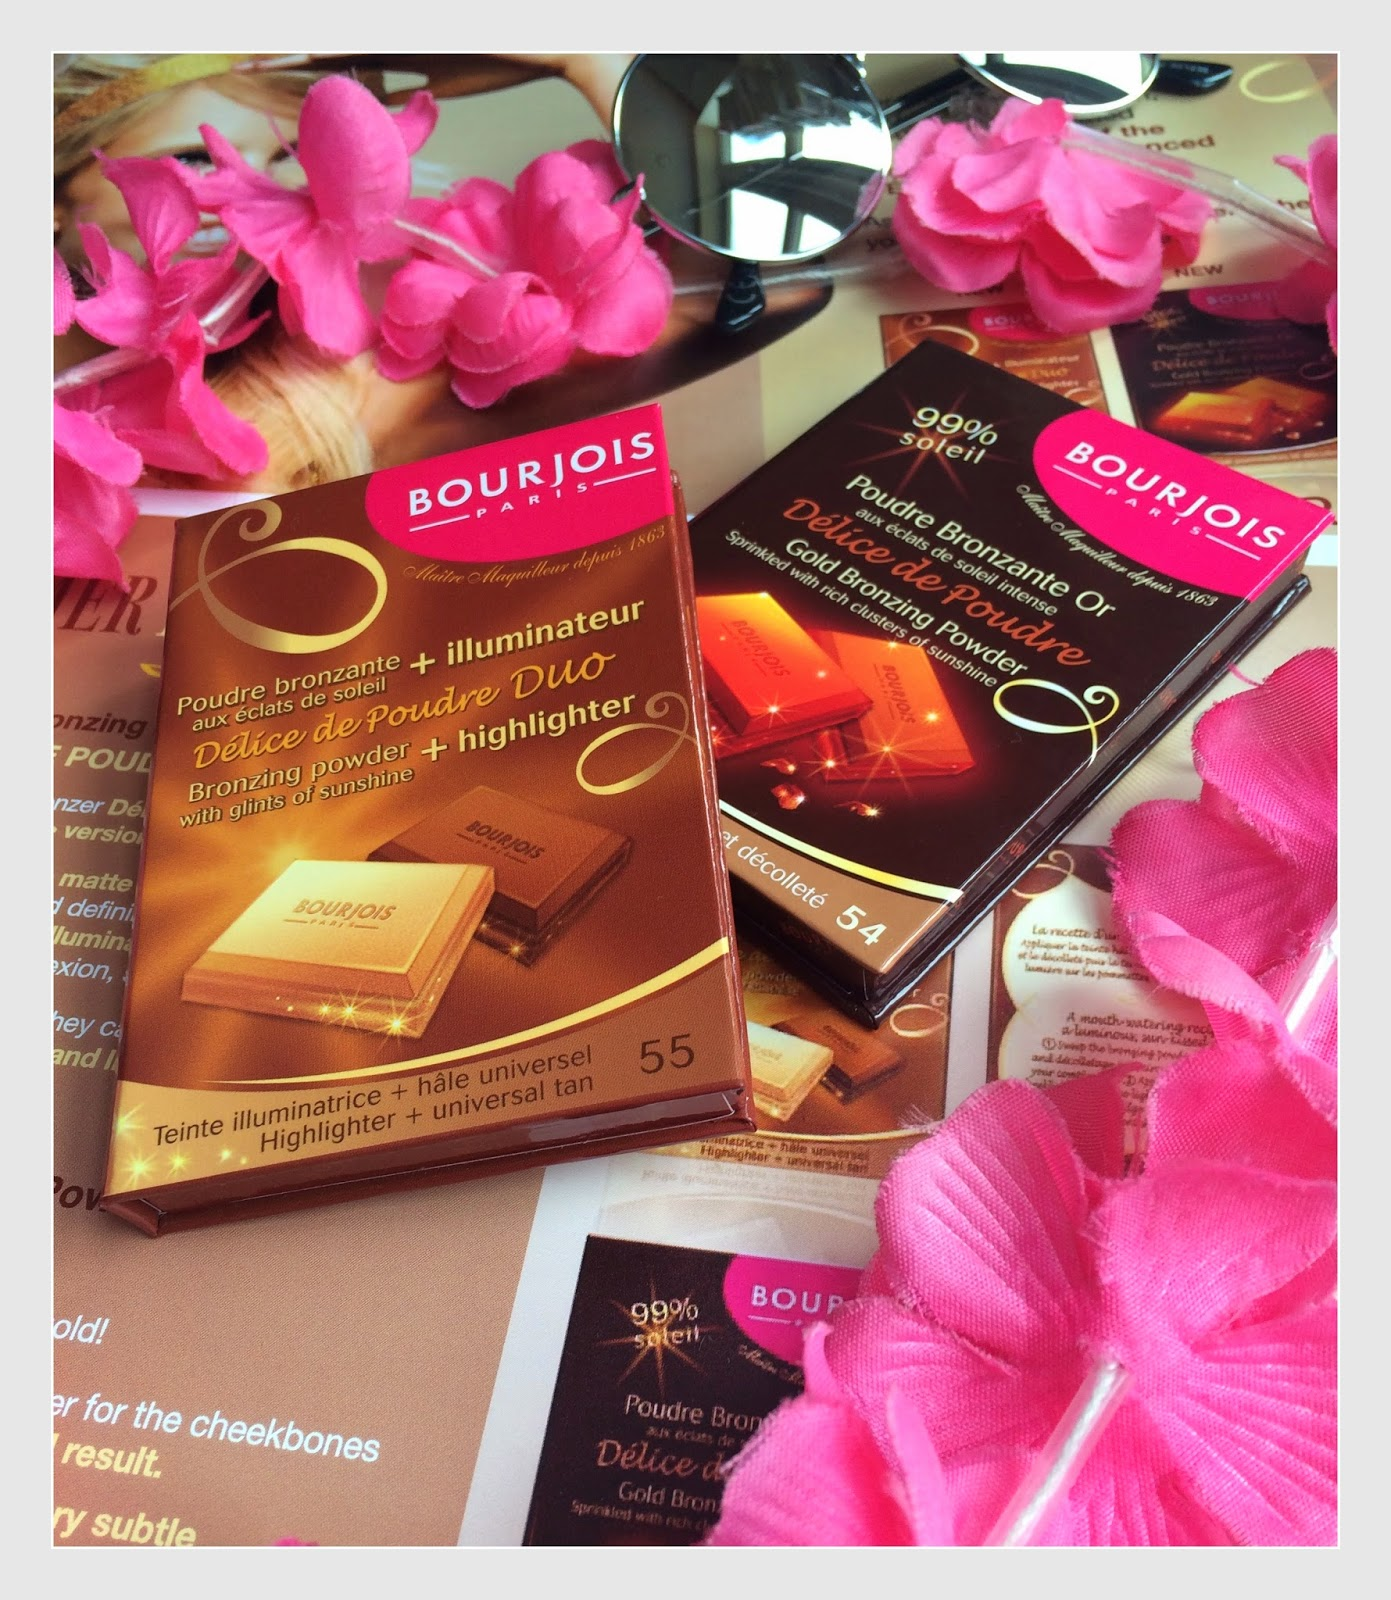 Delice-De-Poudre-Duo-delice-de-poudre-gold-bronzing-powder